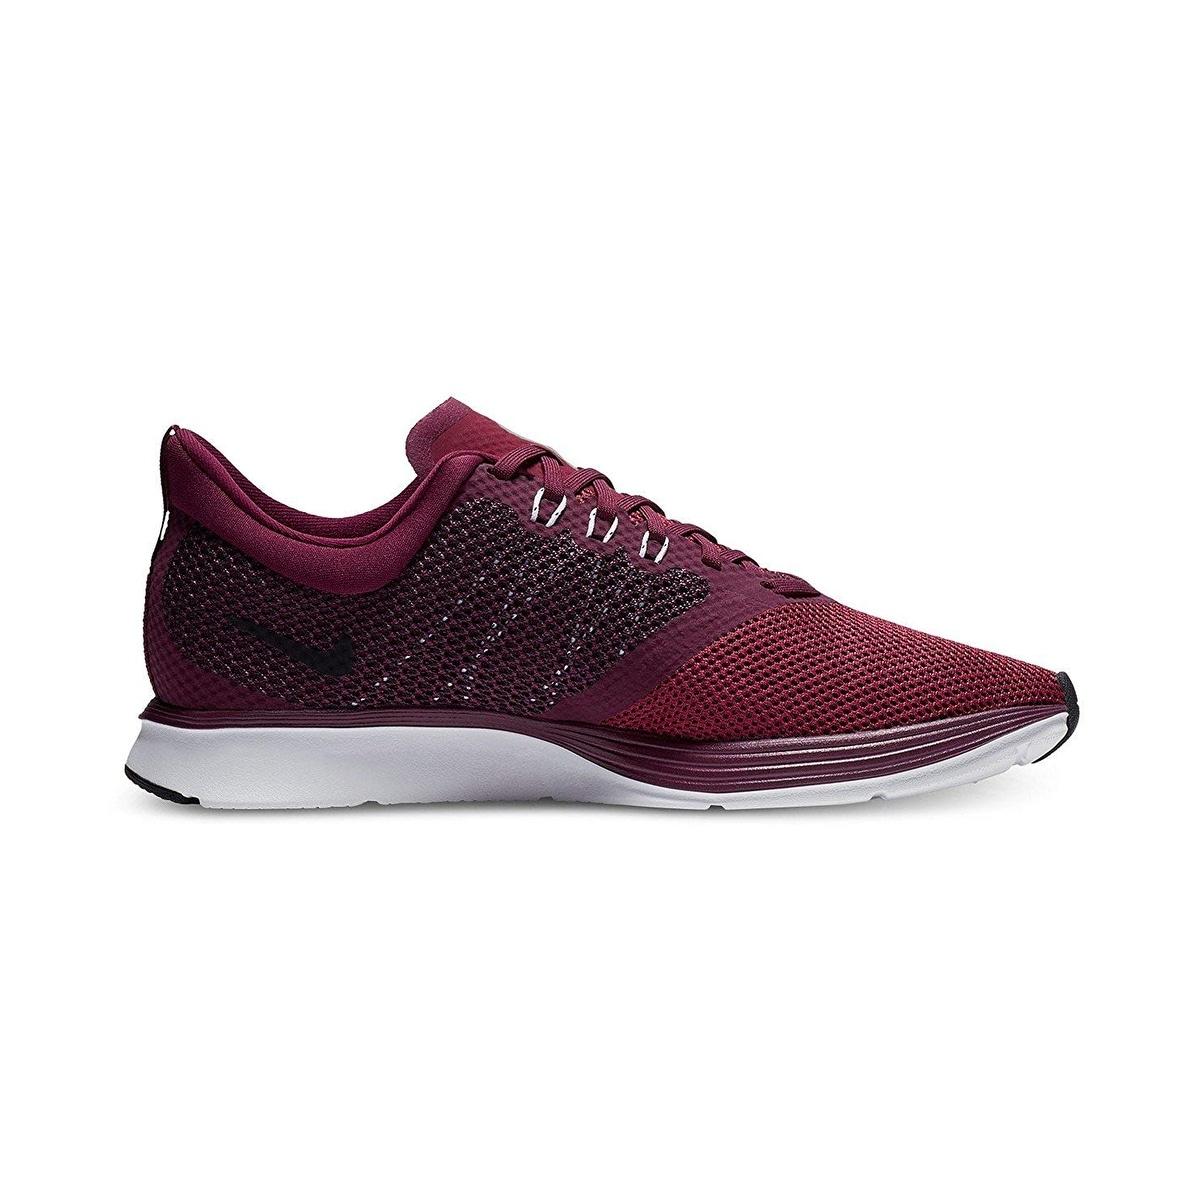 45207f482a19a Nike Womens Wmns Zoom Strike Bordeaux/Black Rush Maroon Wht Size 8